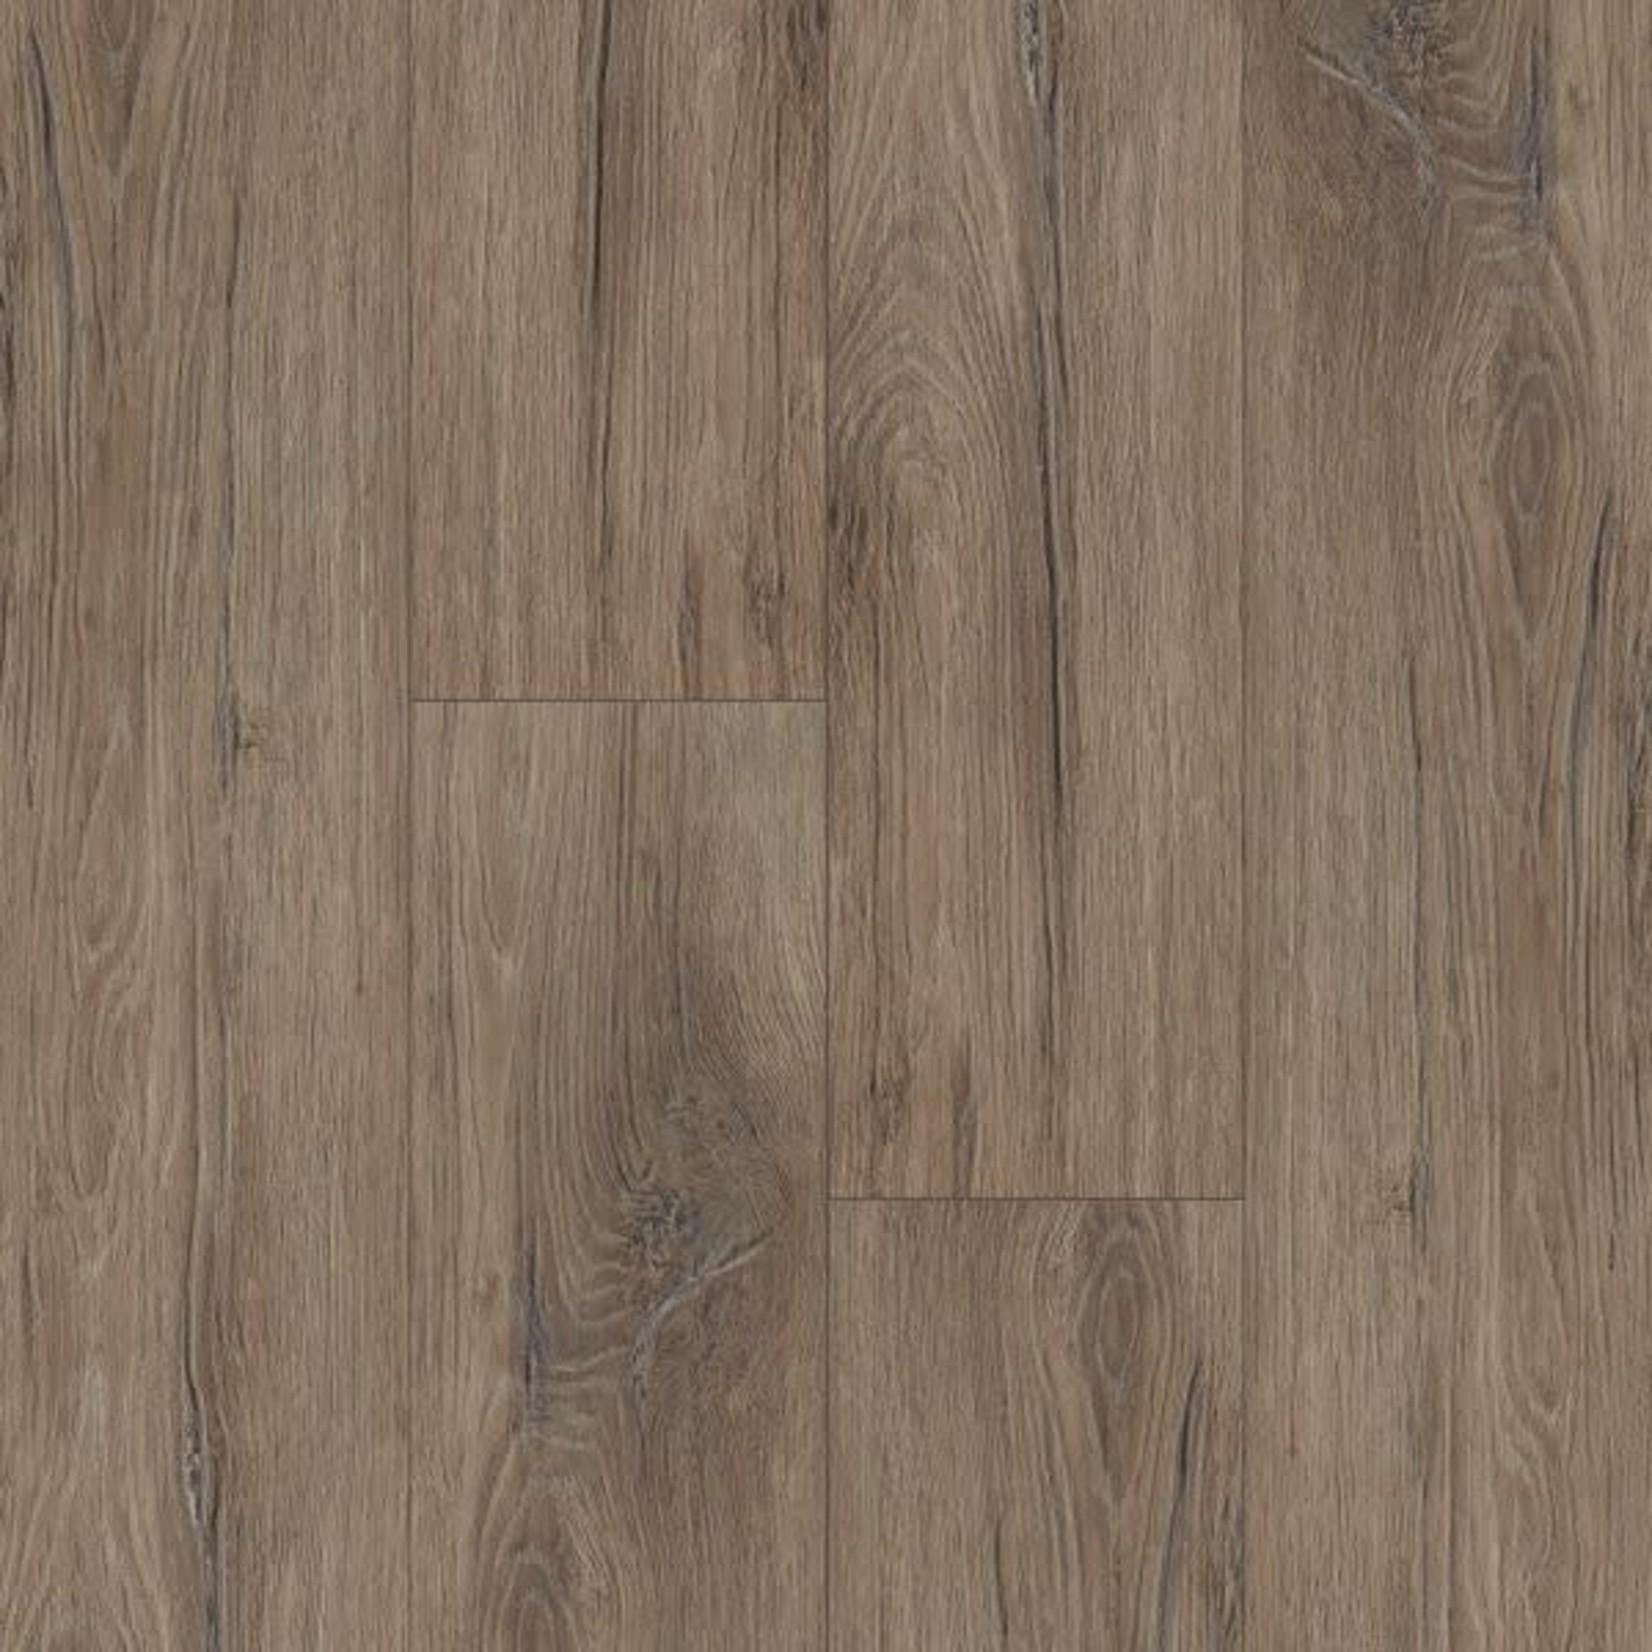 Golden Select Sherwood 19.2 cm (7.56 in.) Rigid Core Laminate Flooring *Open box, missing 2 planks